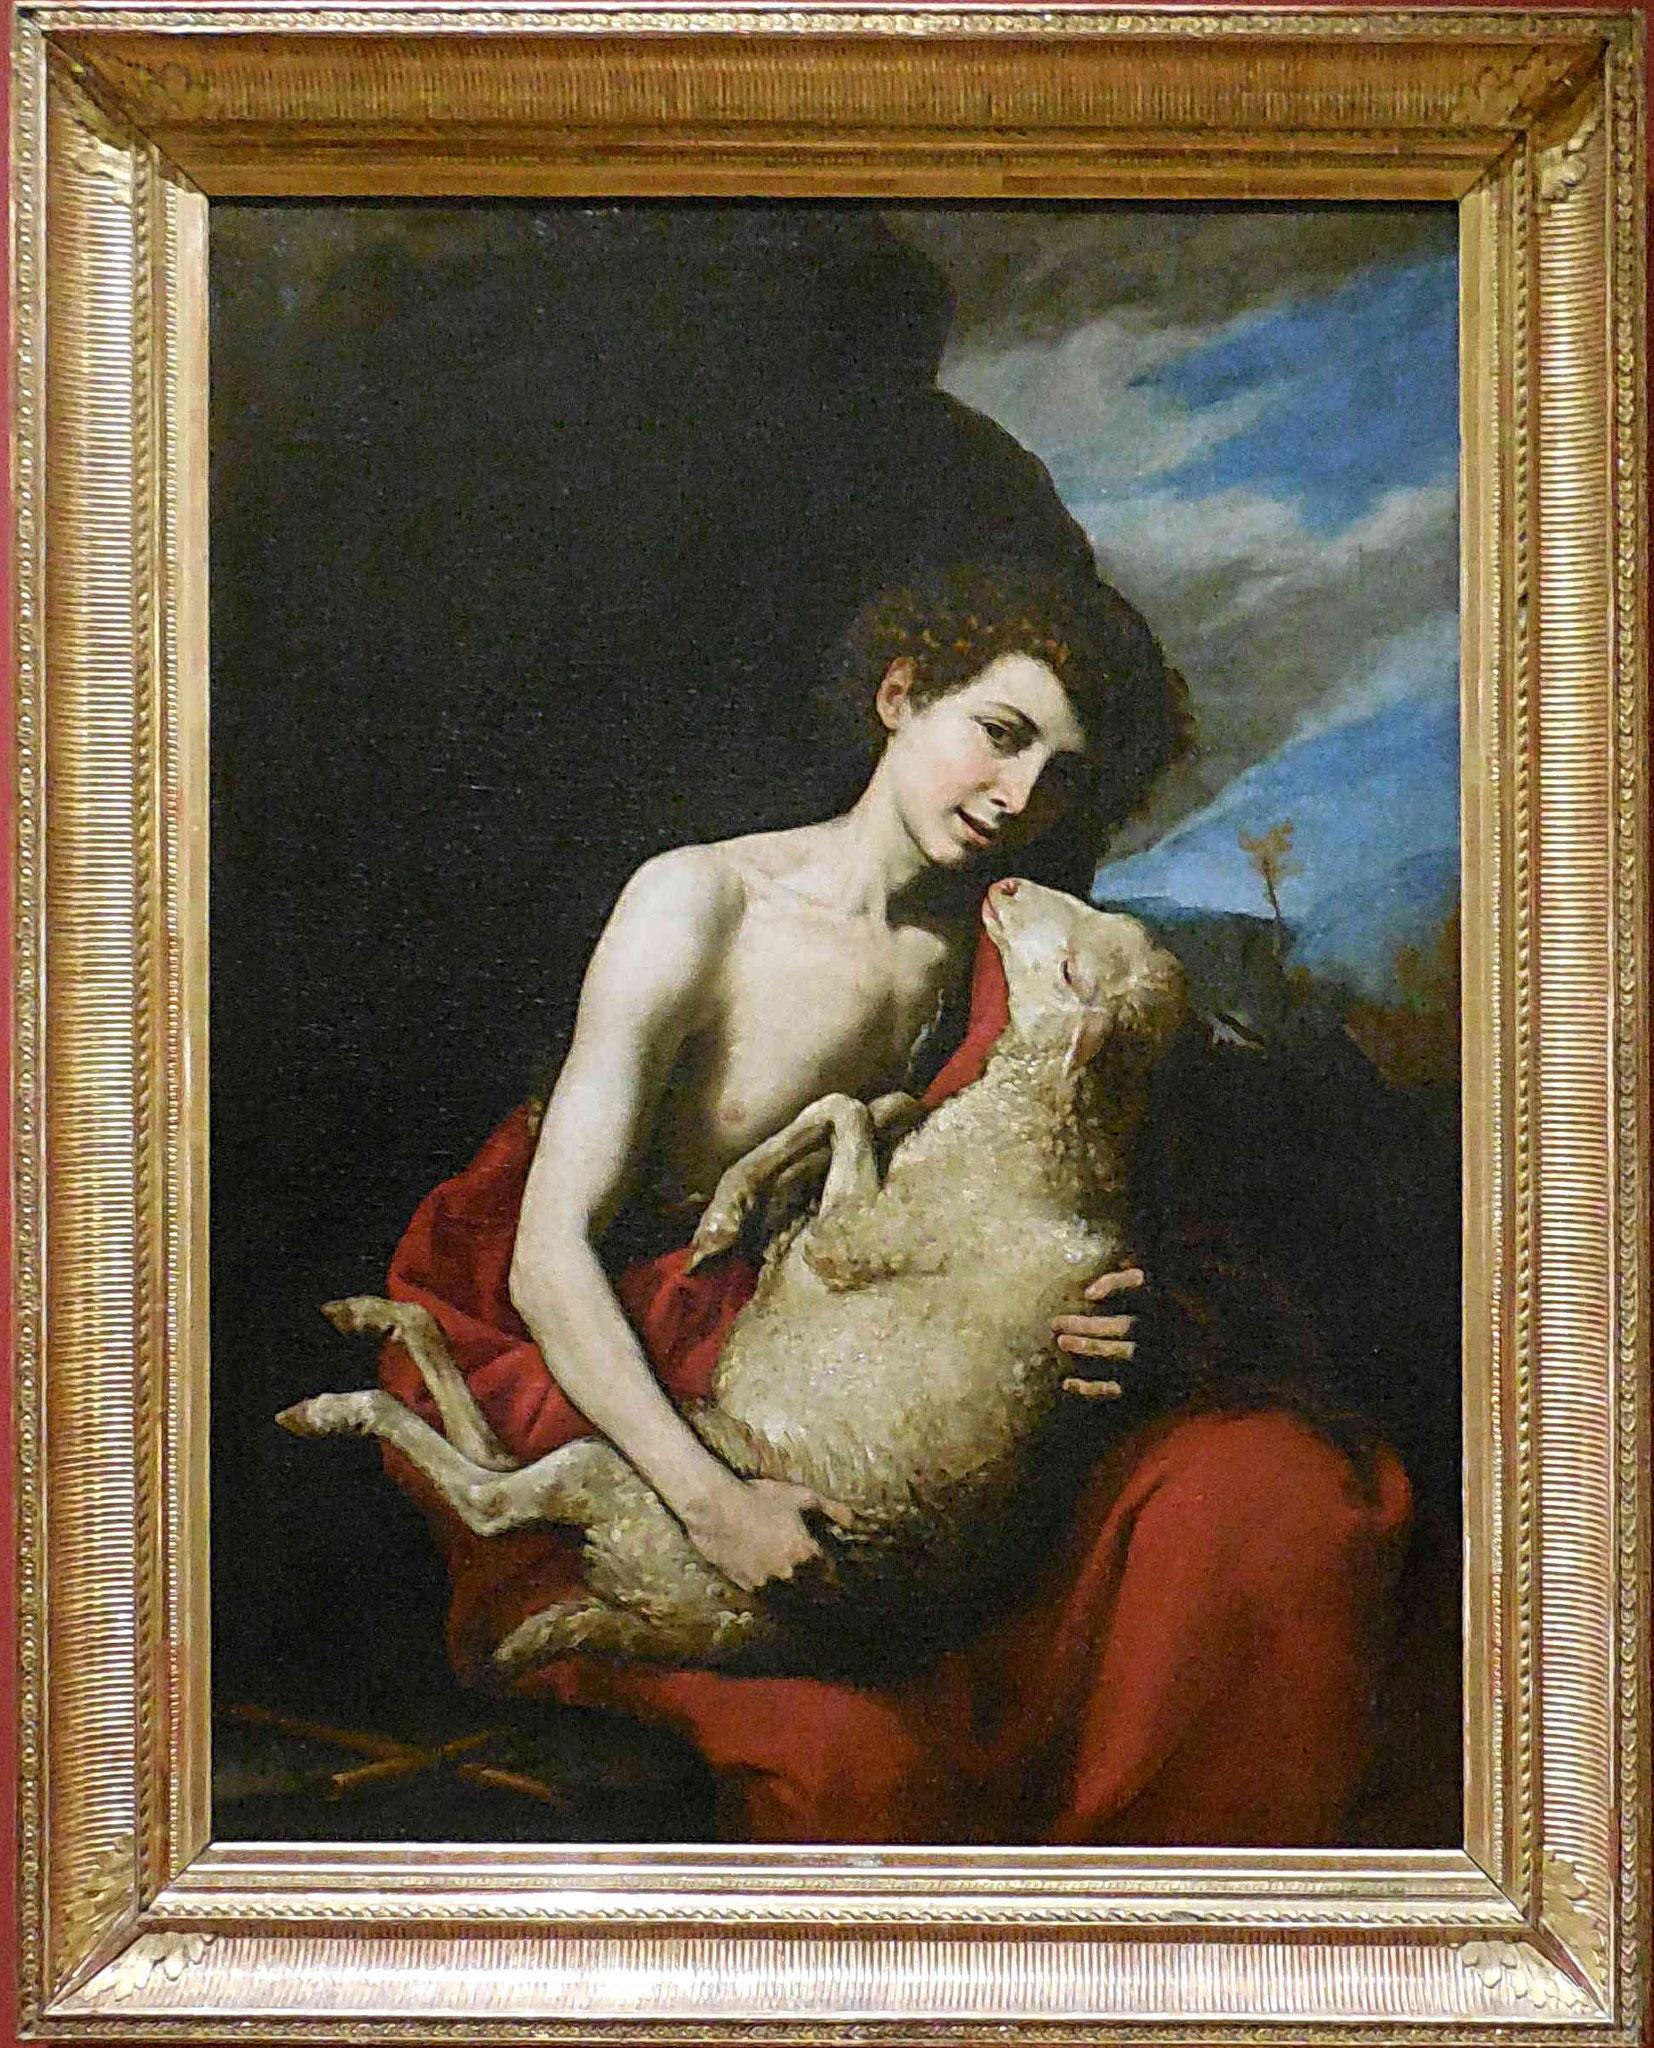 Jusepe de Ribera, Saint Jean Baptiste avec l'agneau, vers 1630 /